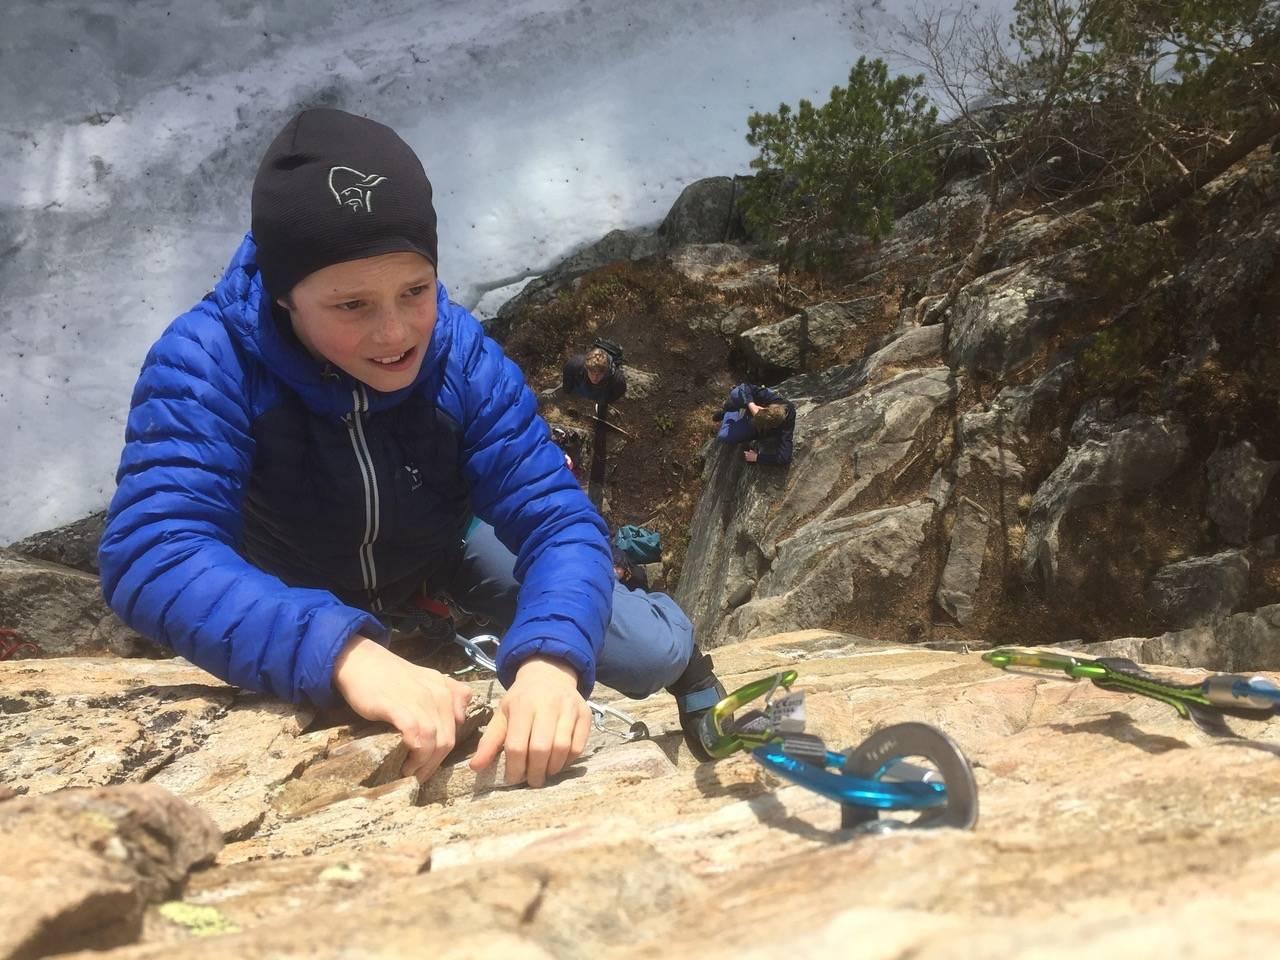 PÅ LED: 12-åringen Erlend Wassdahl Meirik klatrer på Ishoel i Oppdal. Foto: Tore Meirik